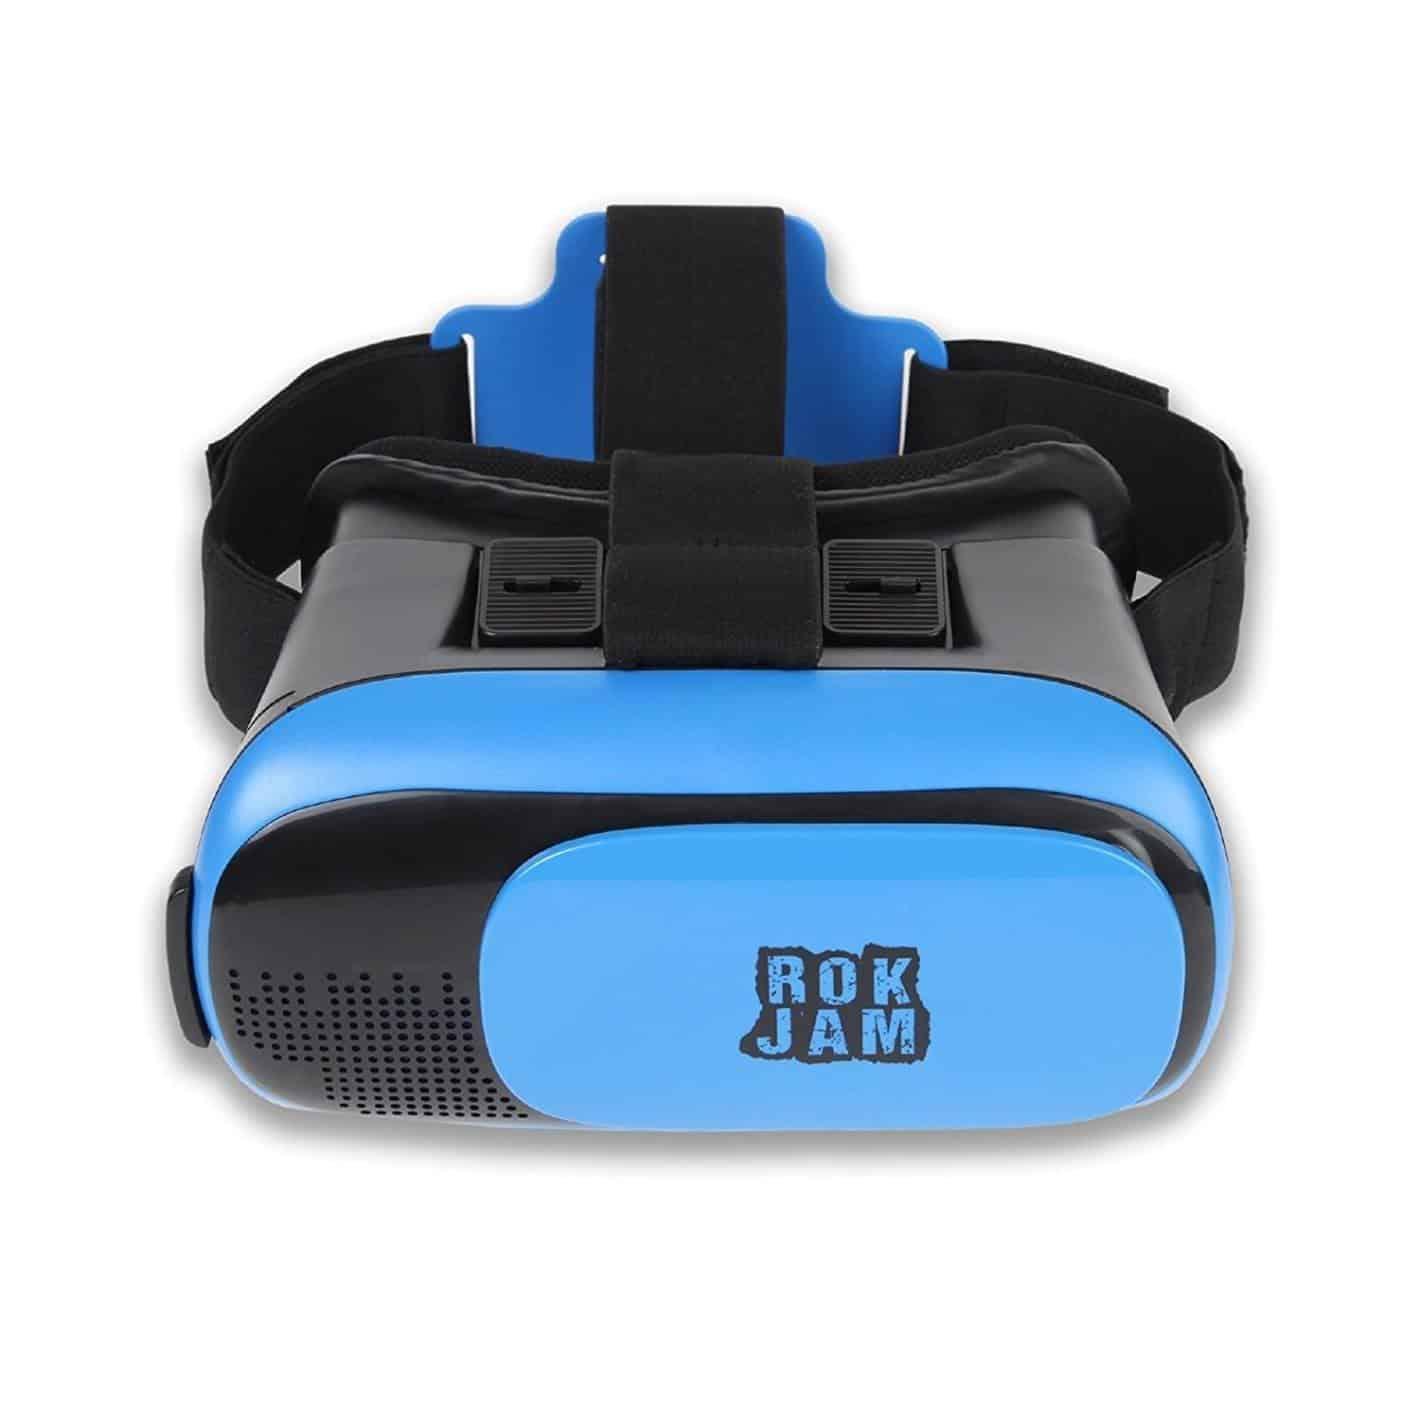 ROKJAM 3D VR